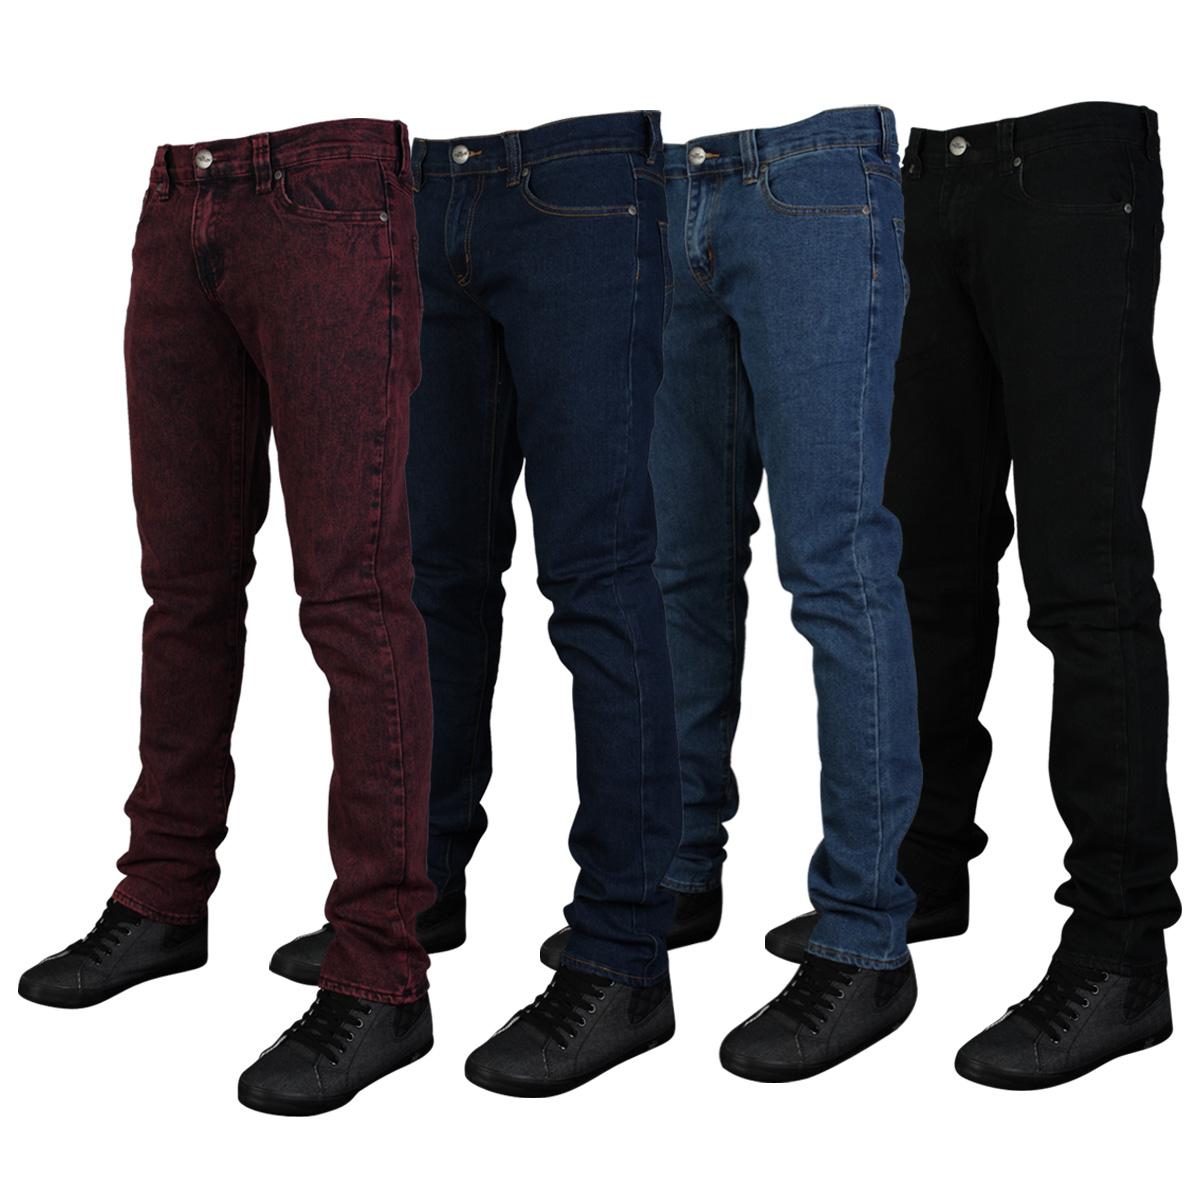 Black Skinny Stretch Jeans - Most Popular Jeans 2017